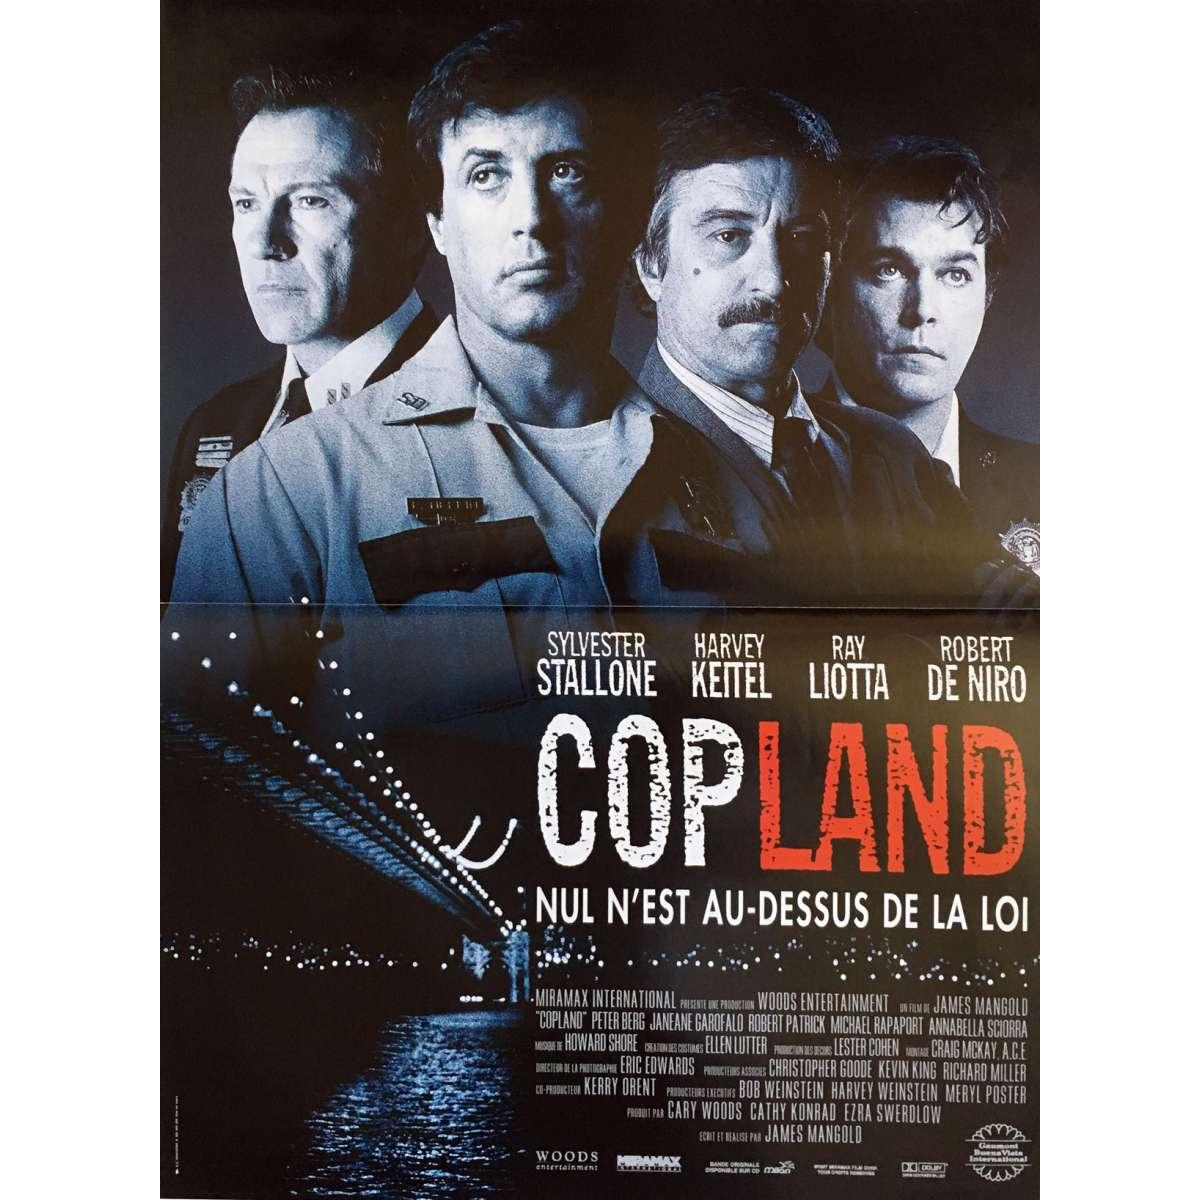 COP LAND Movie Poster